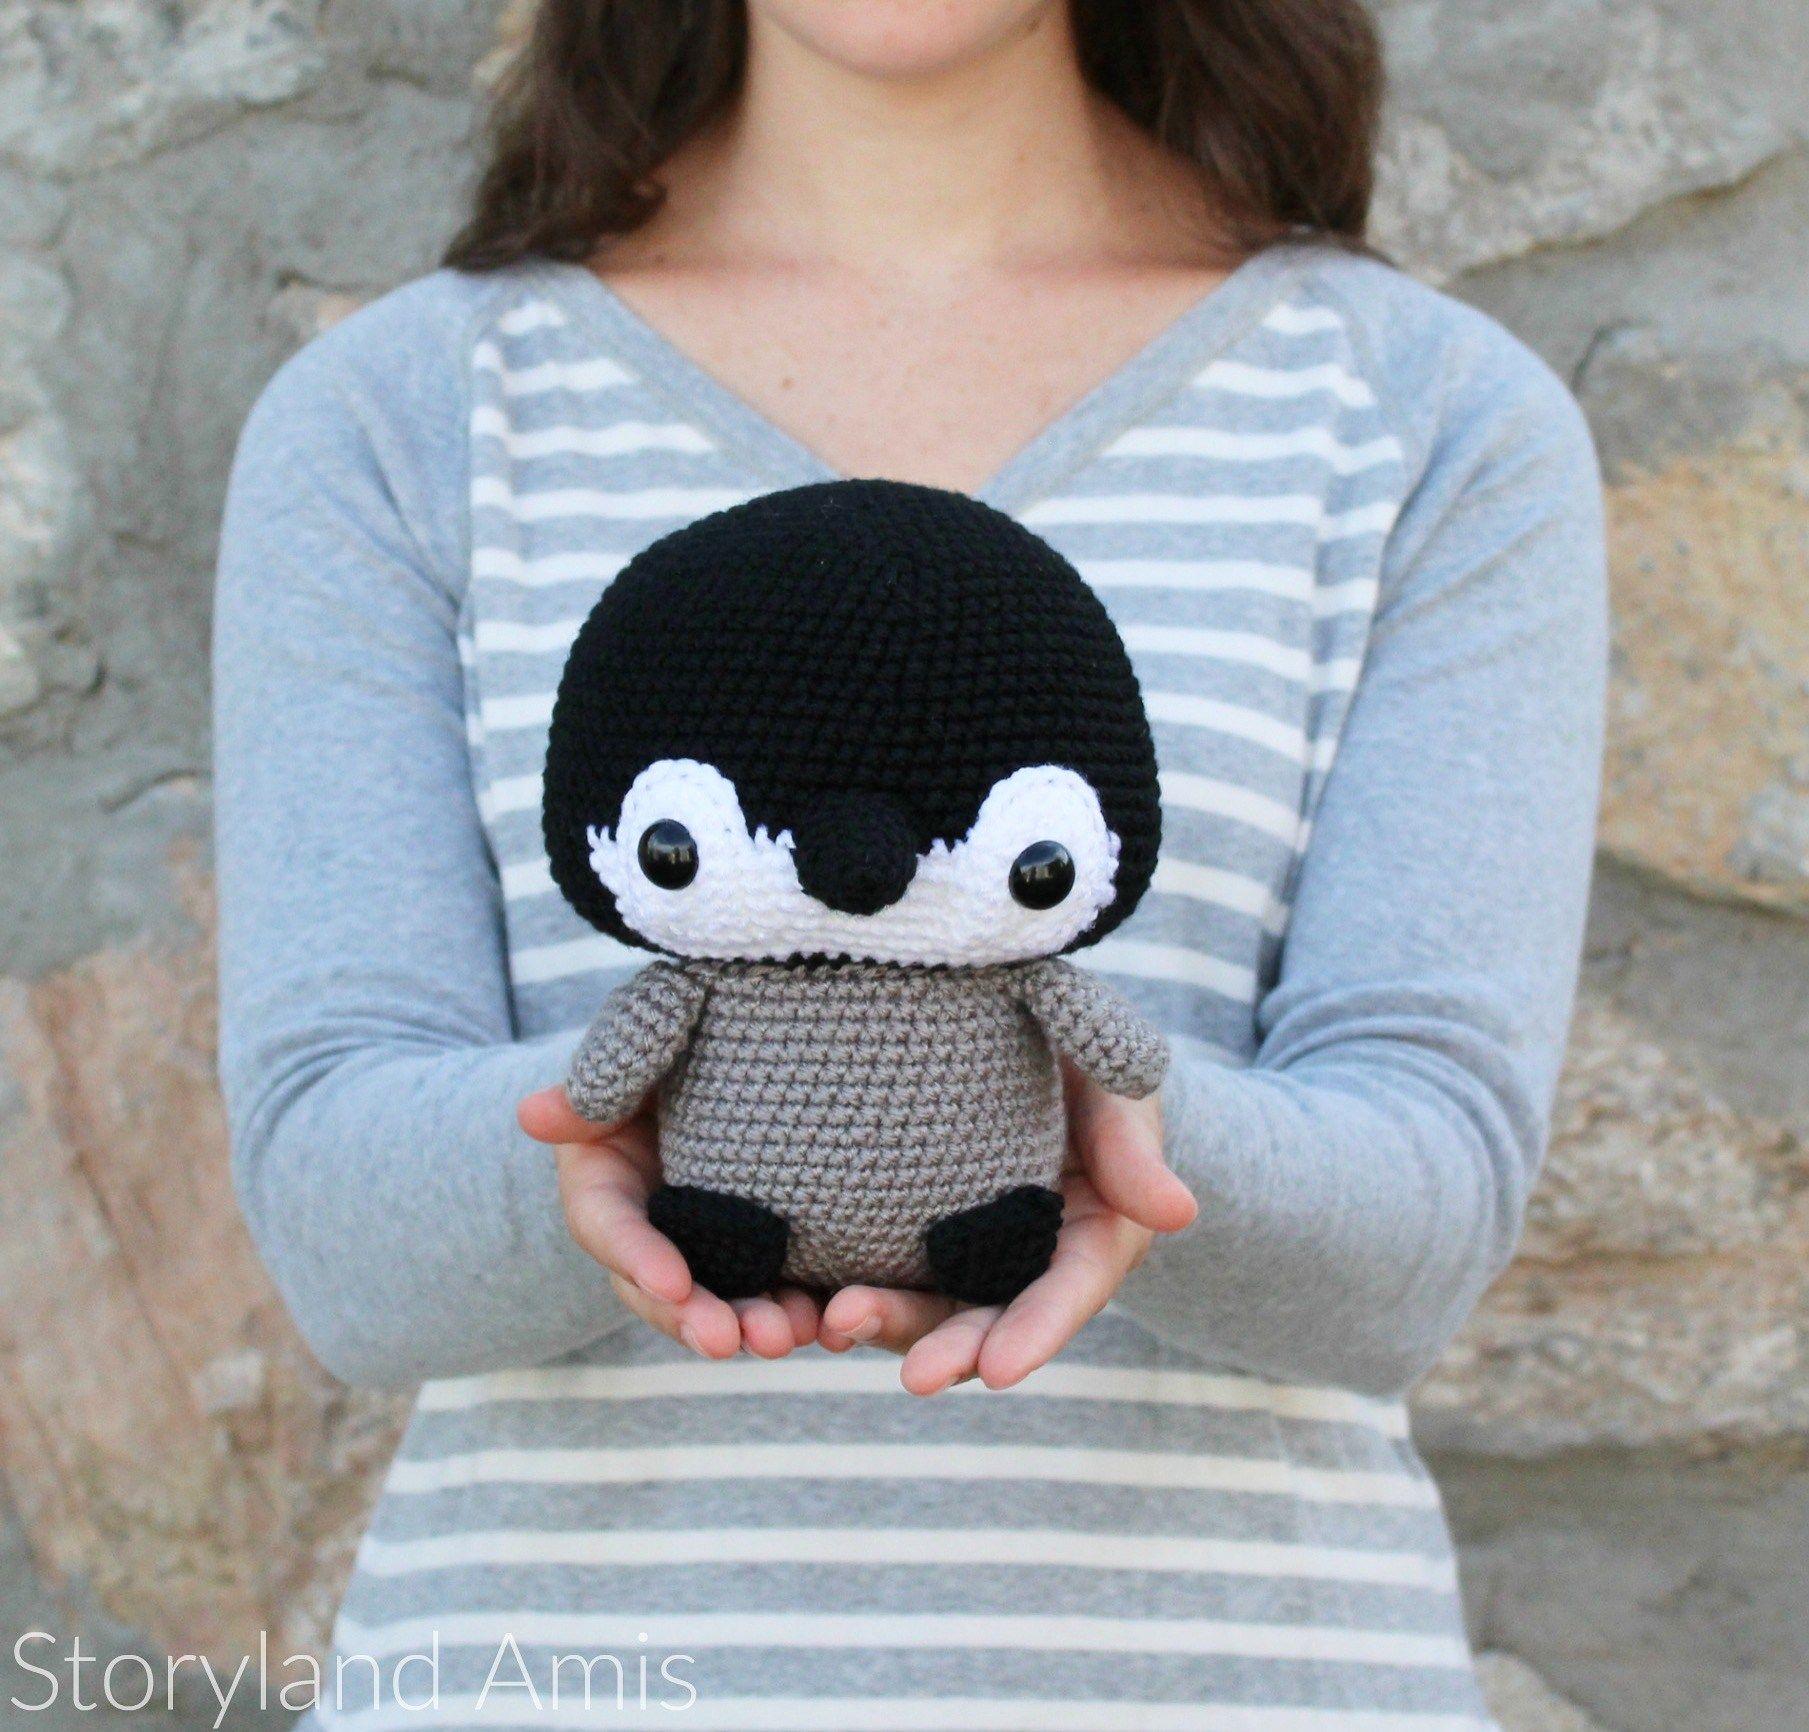 Storyland Amis-Cuddle-Sized Penguin Pattern | DIY - Crochet ...